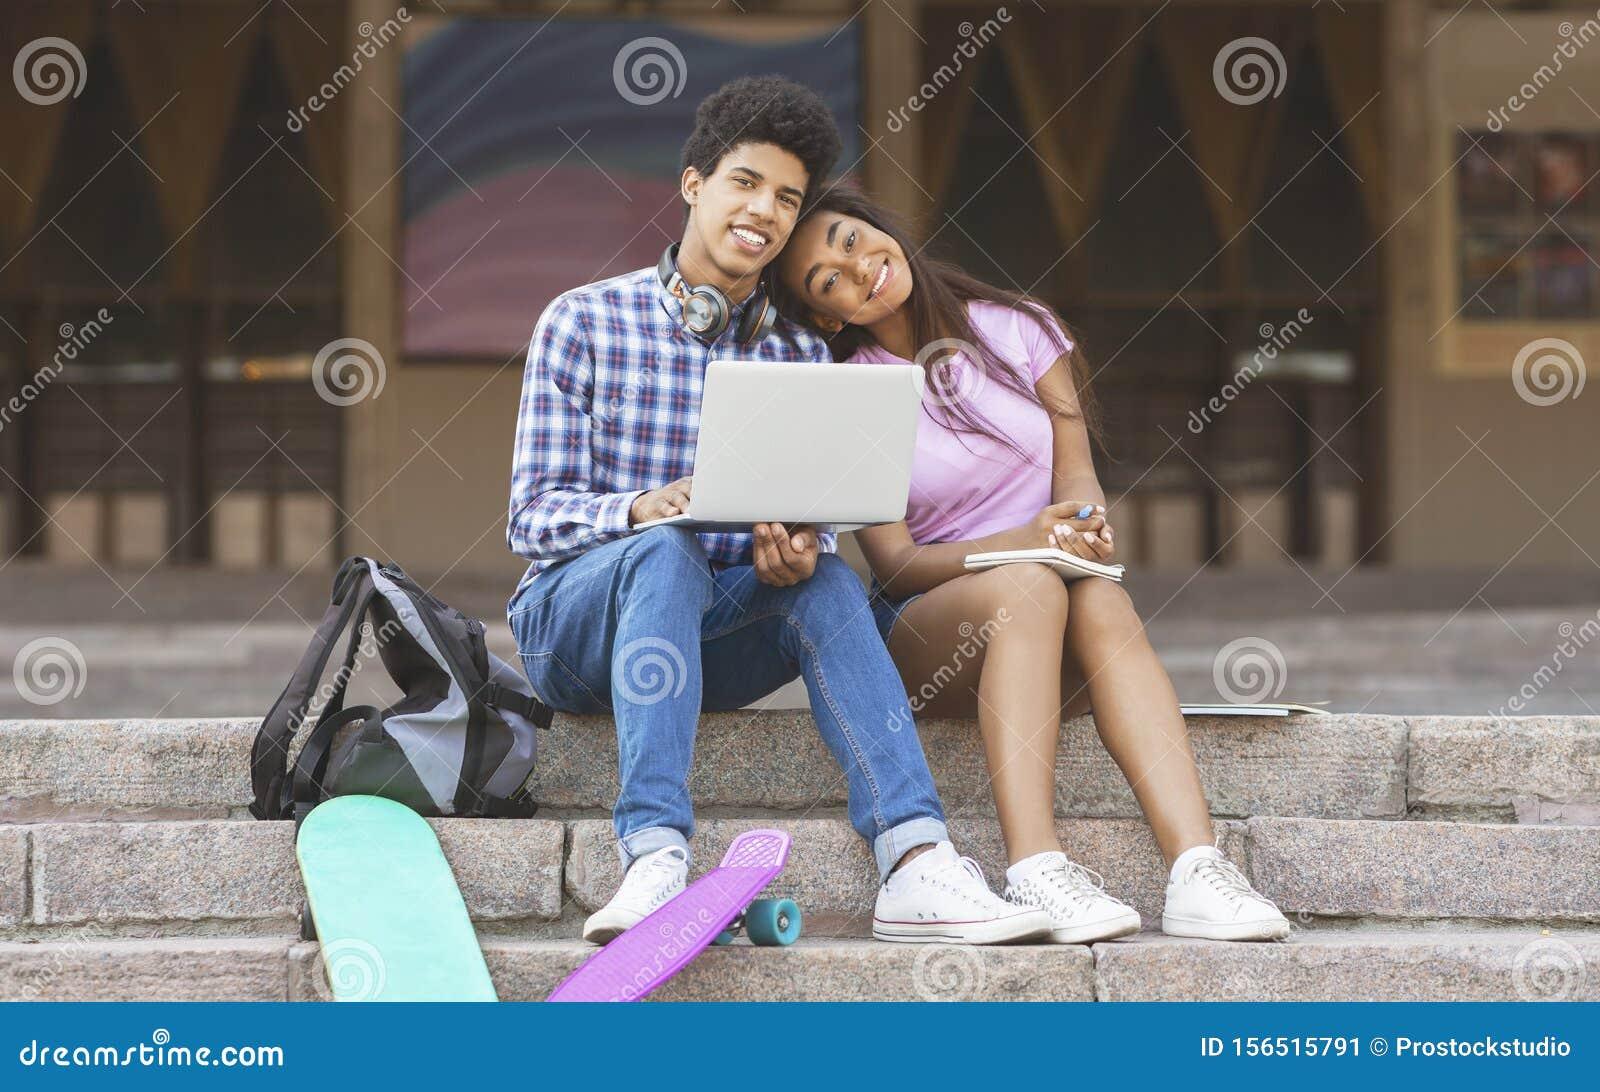 Couple of romantic teens enjoying browsing internet on laptop outdoors